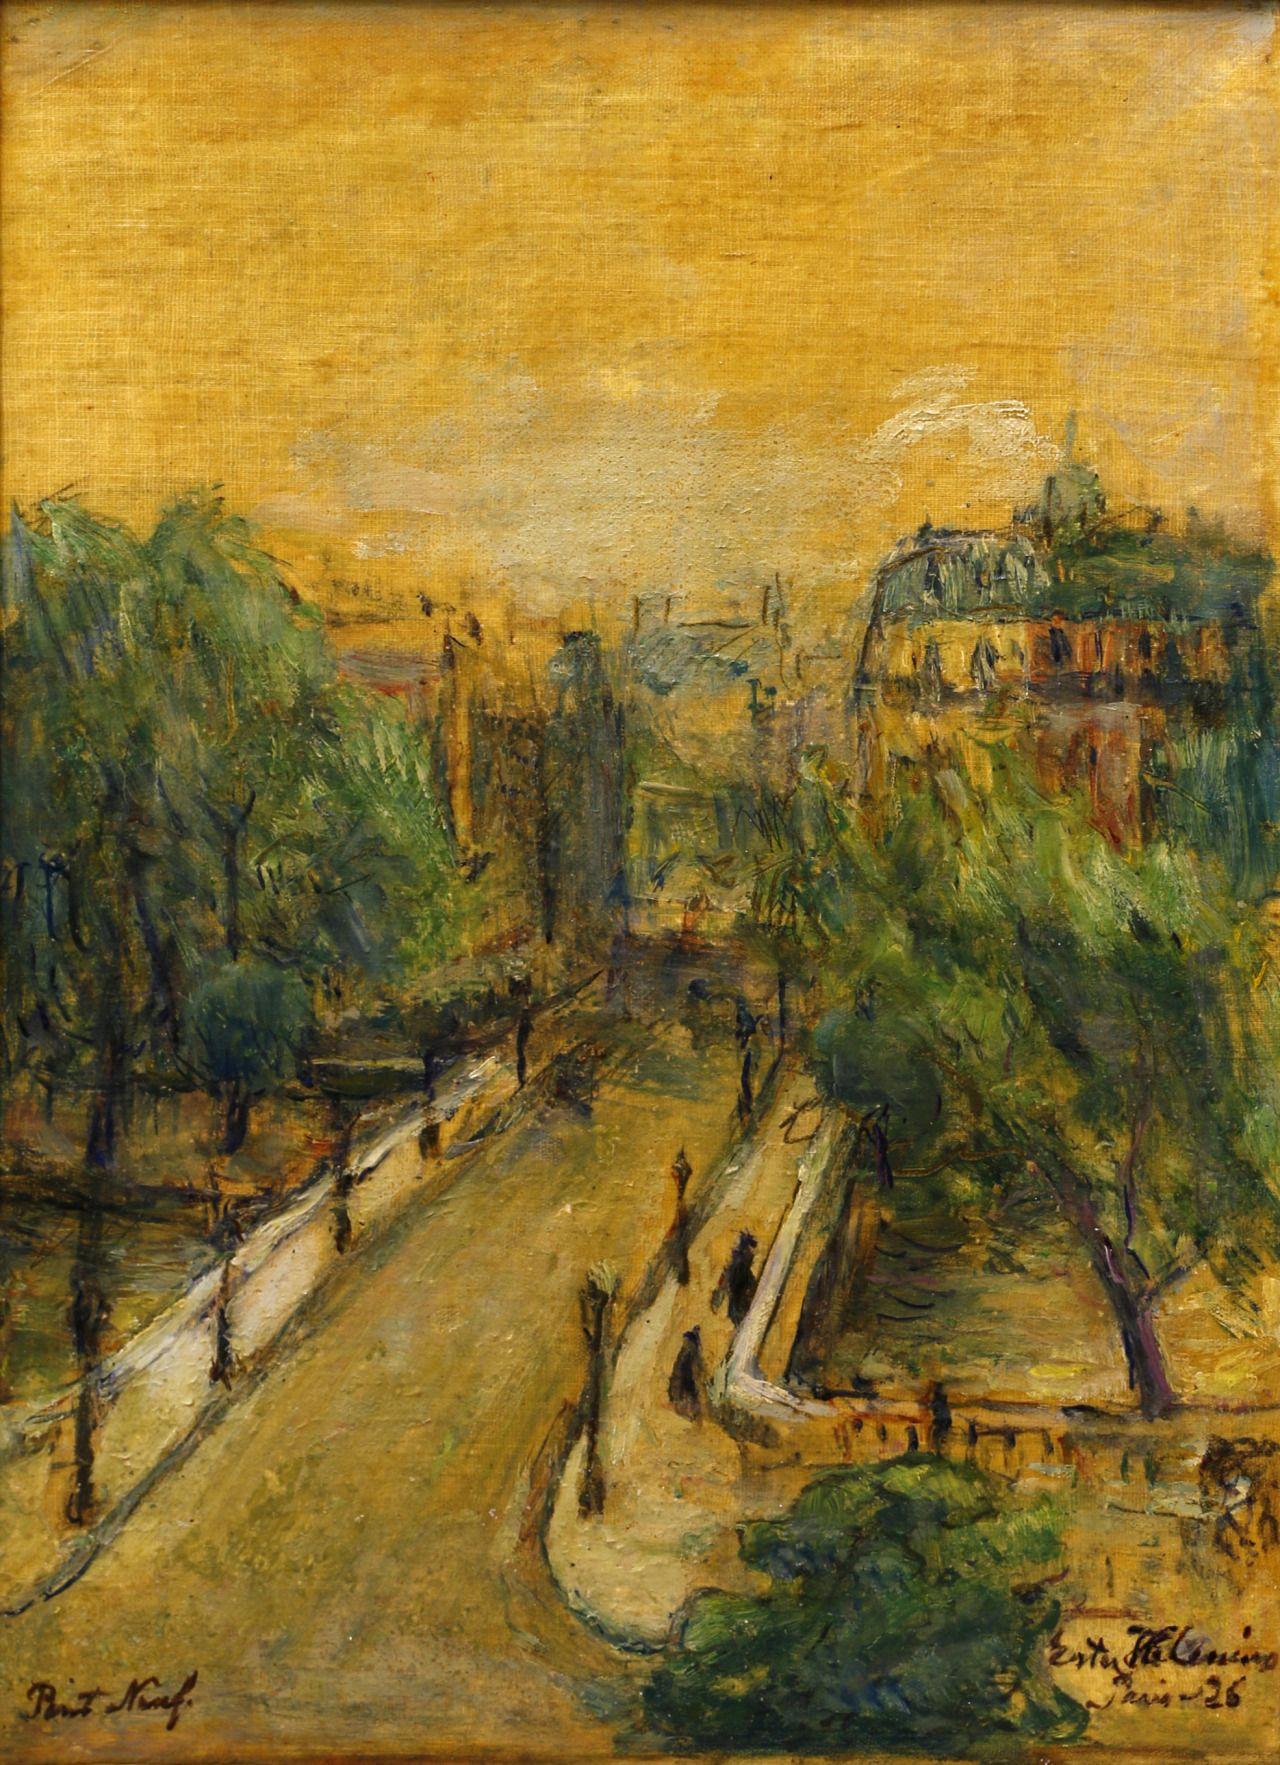 Pont Neuf, Paris - Ester Helenius , 1926 Finnish, 1875-1955 oil on canvas 37 x 27 cm. Hämeenlinna Art Museum.